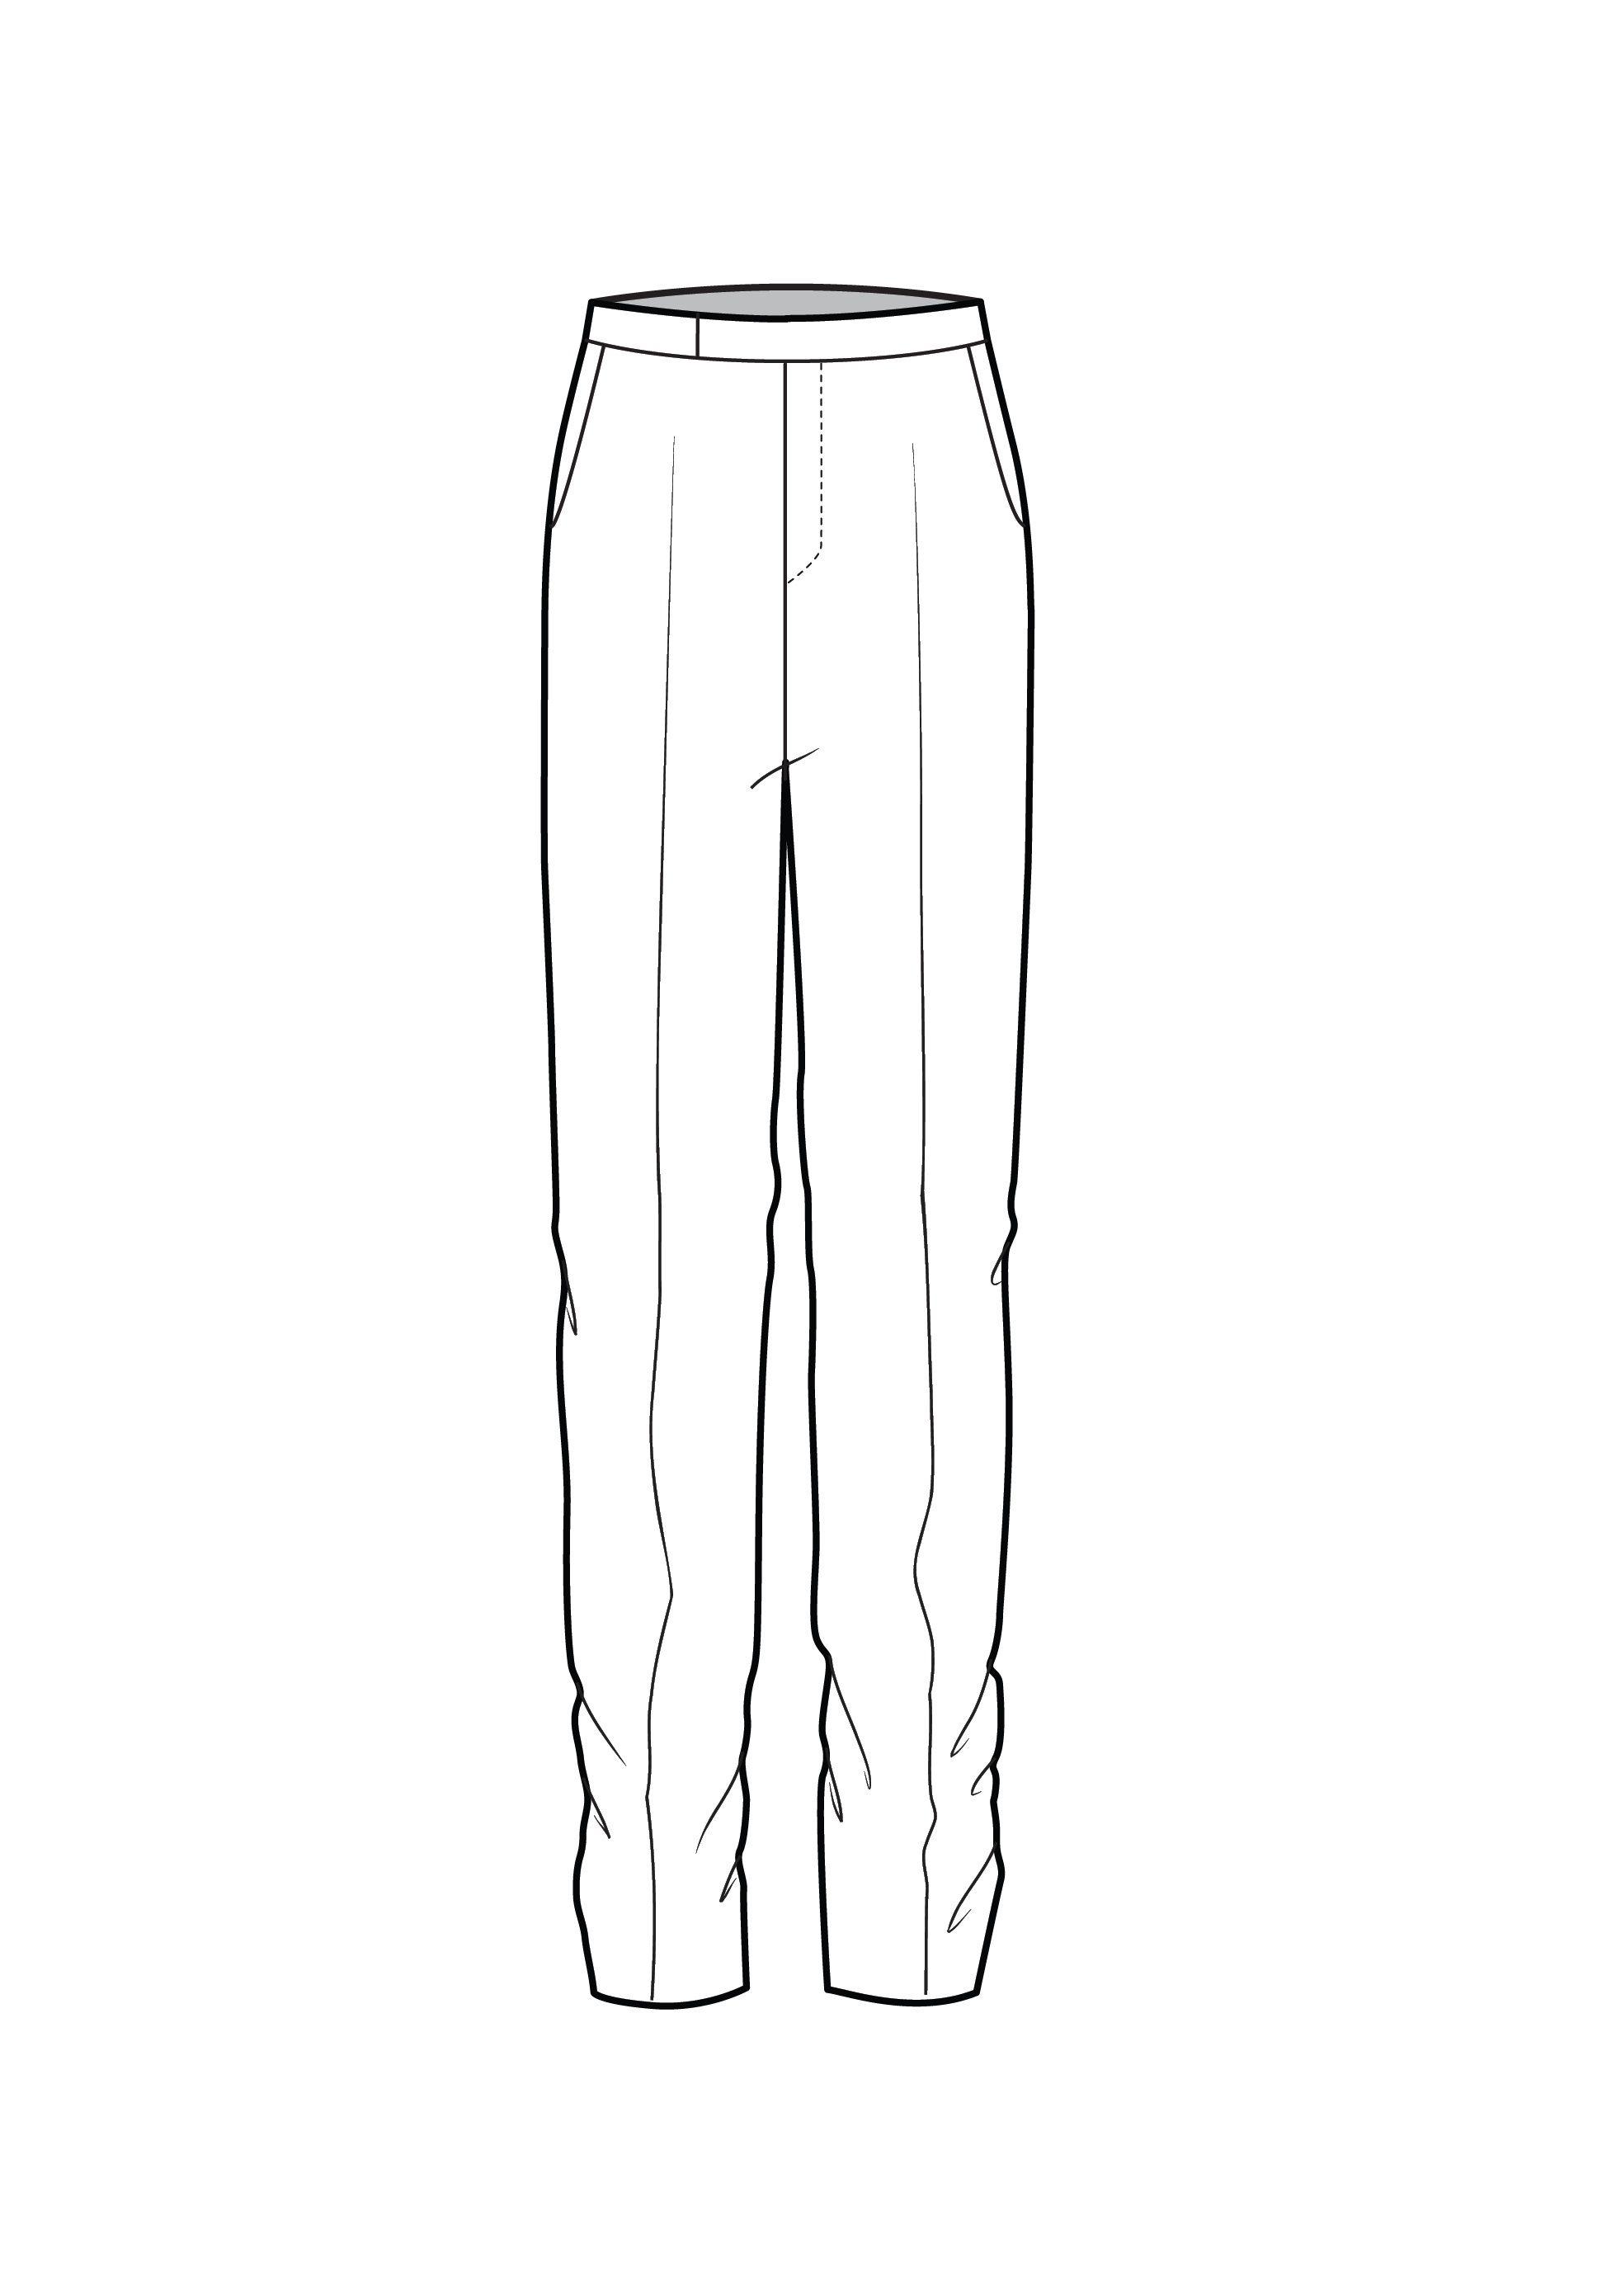 Tailored trousers | fichas tecnicas/dibujo plano | Pinterest ...